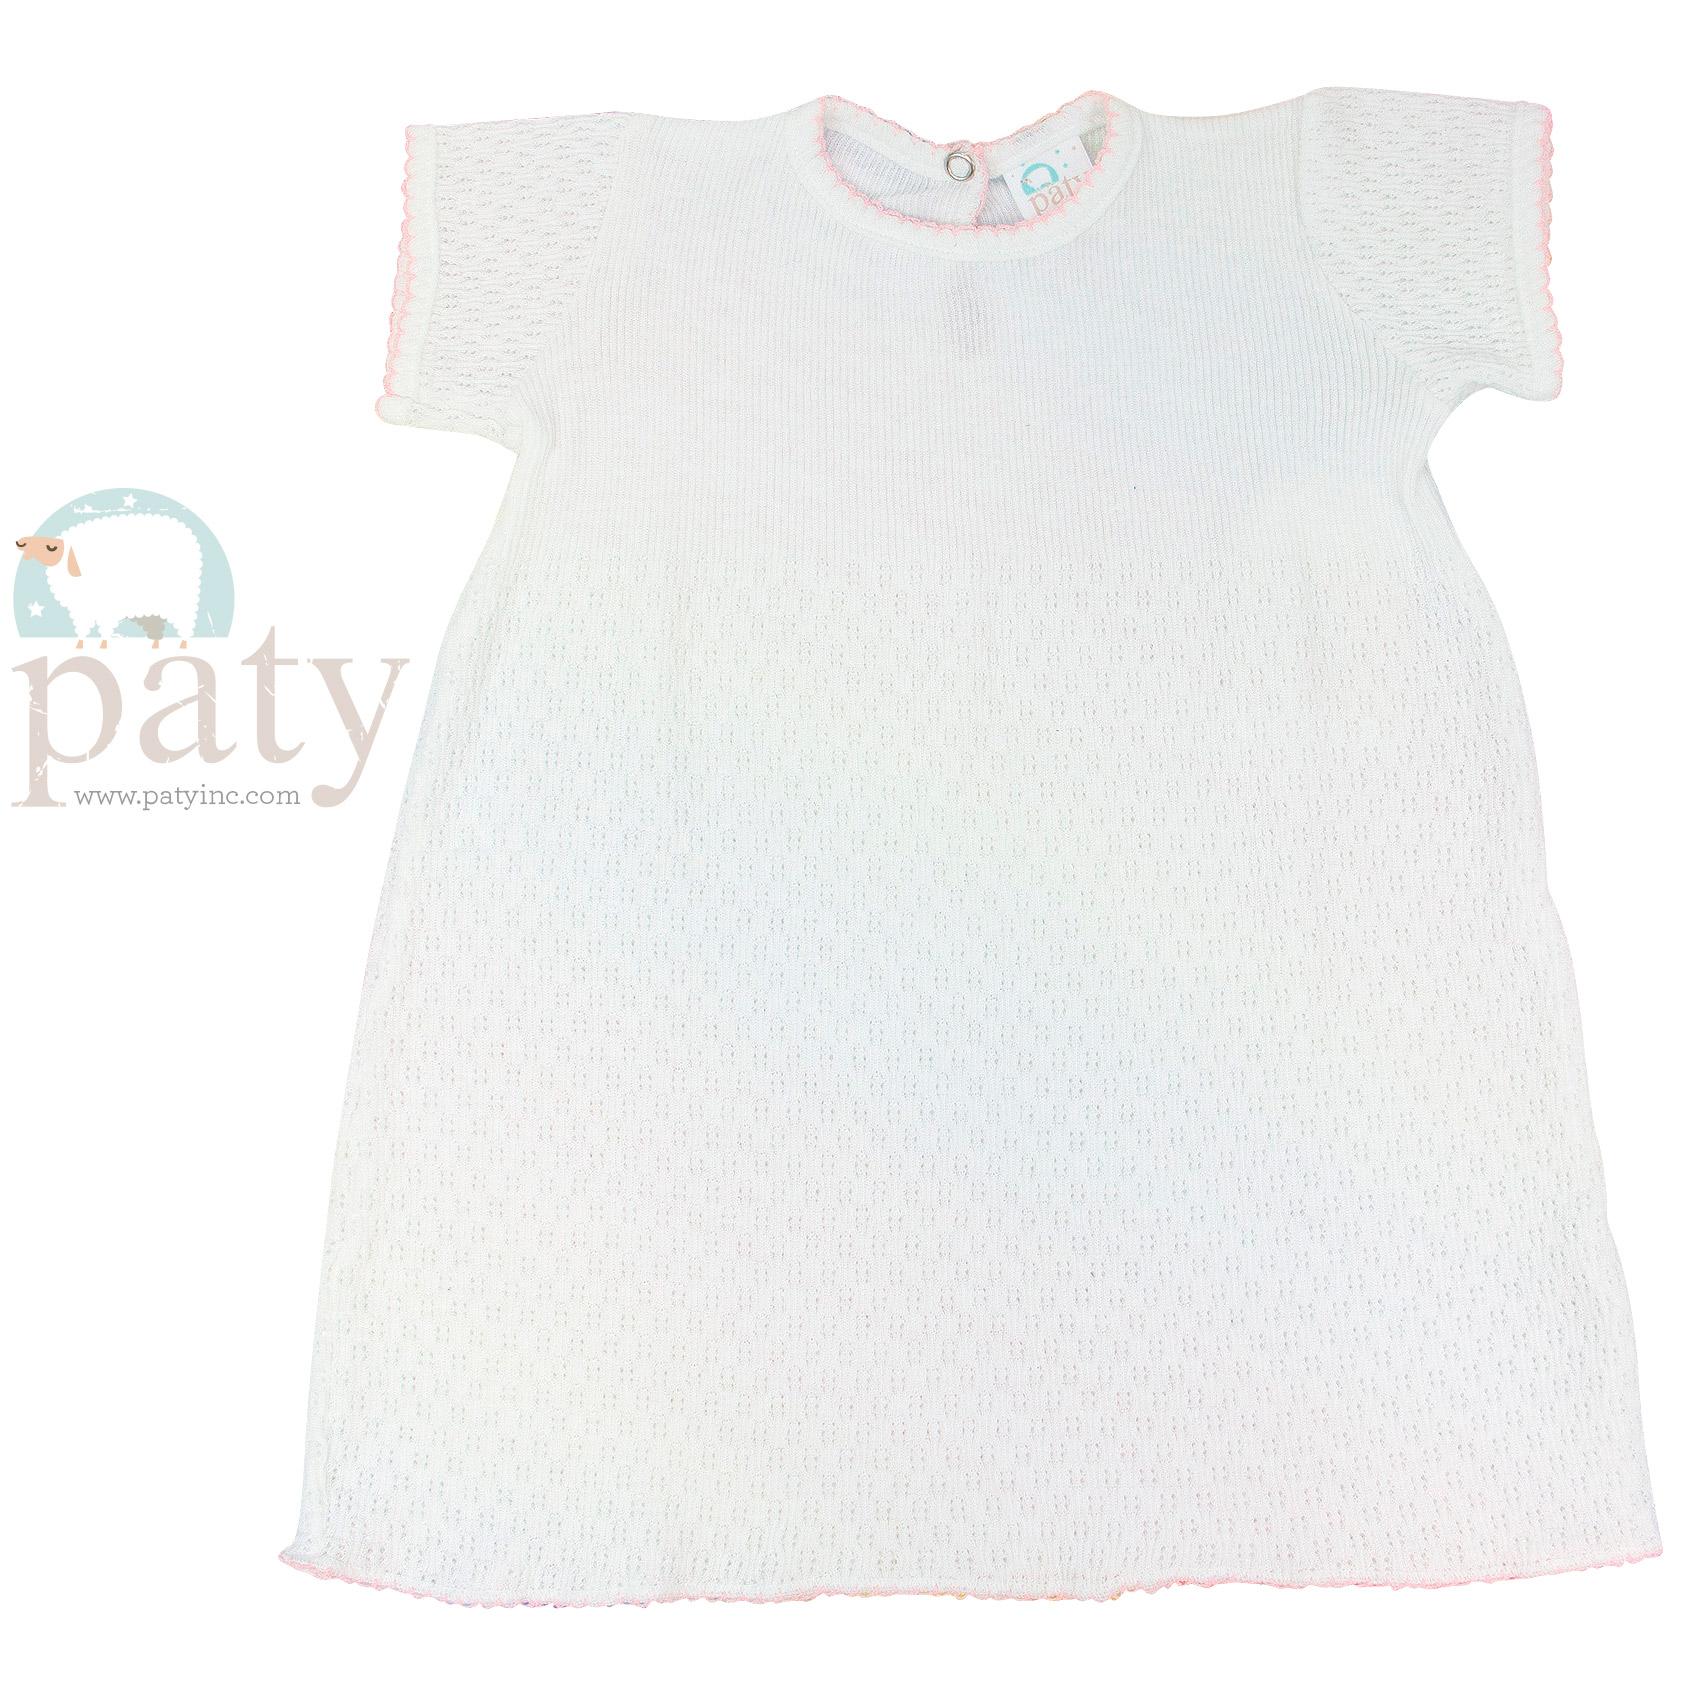 Paty Knit Short Sleeve Dress #103